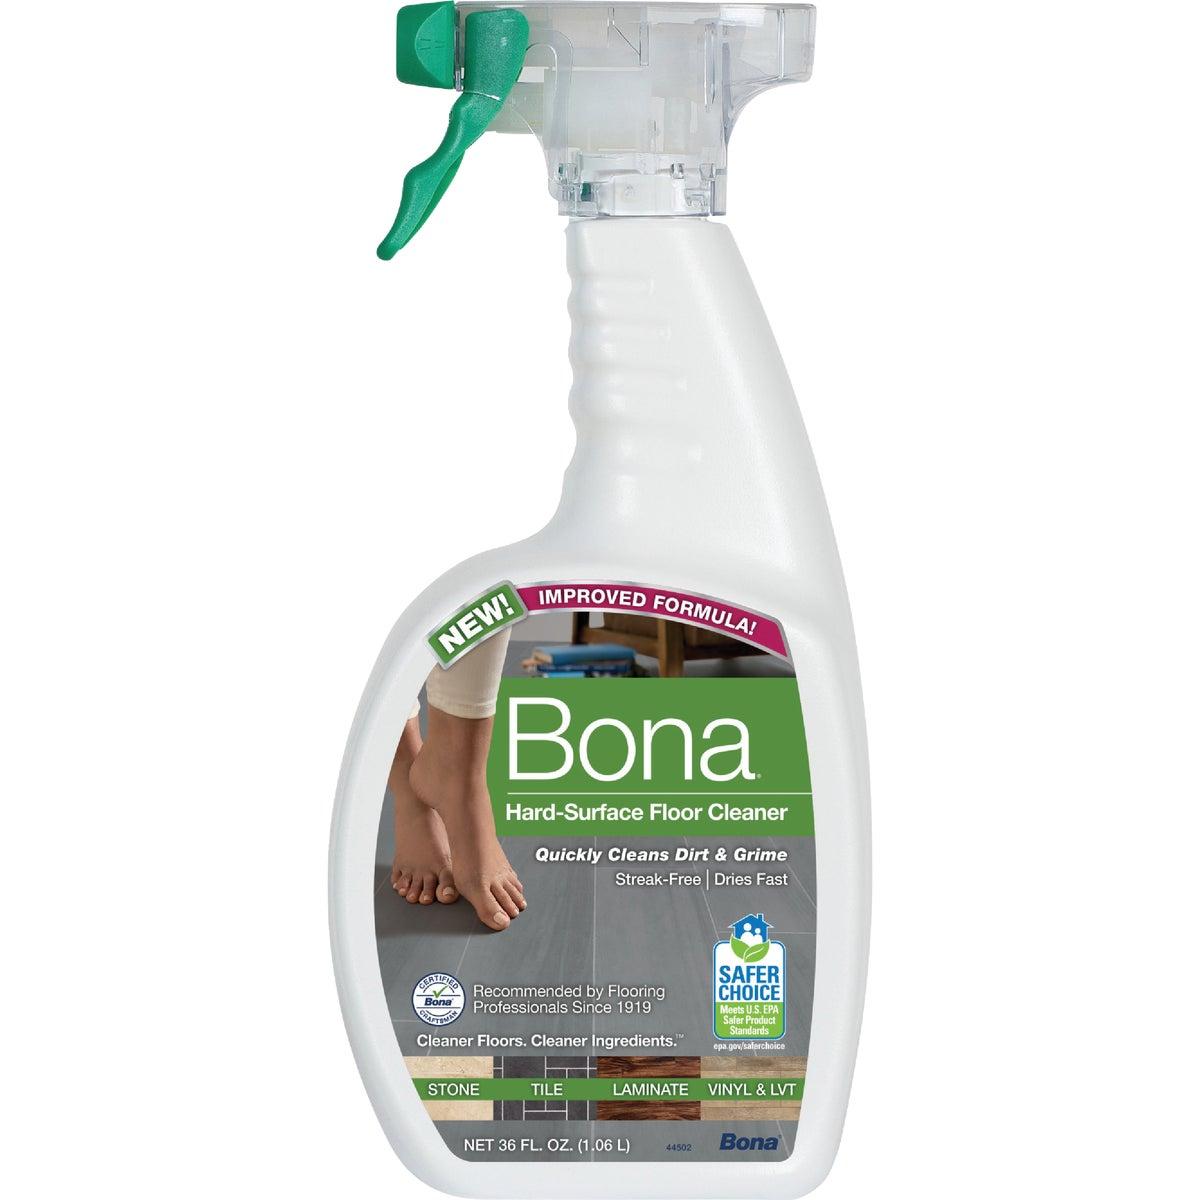 Bona Stone, Tile, & Laminate Floor Cleaner, WM700059002